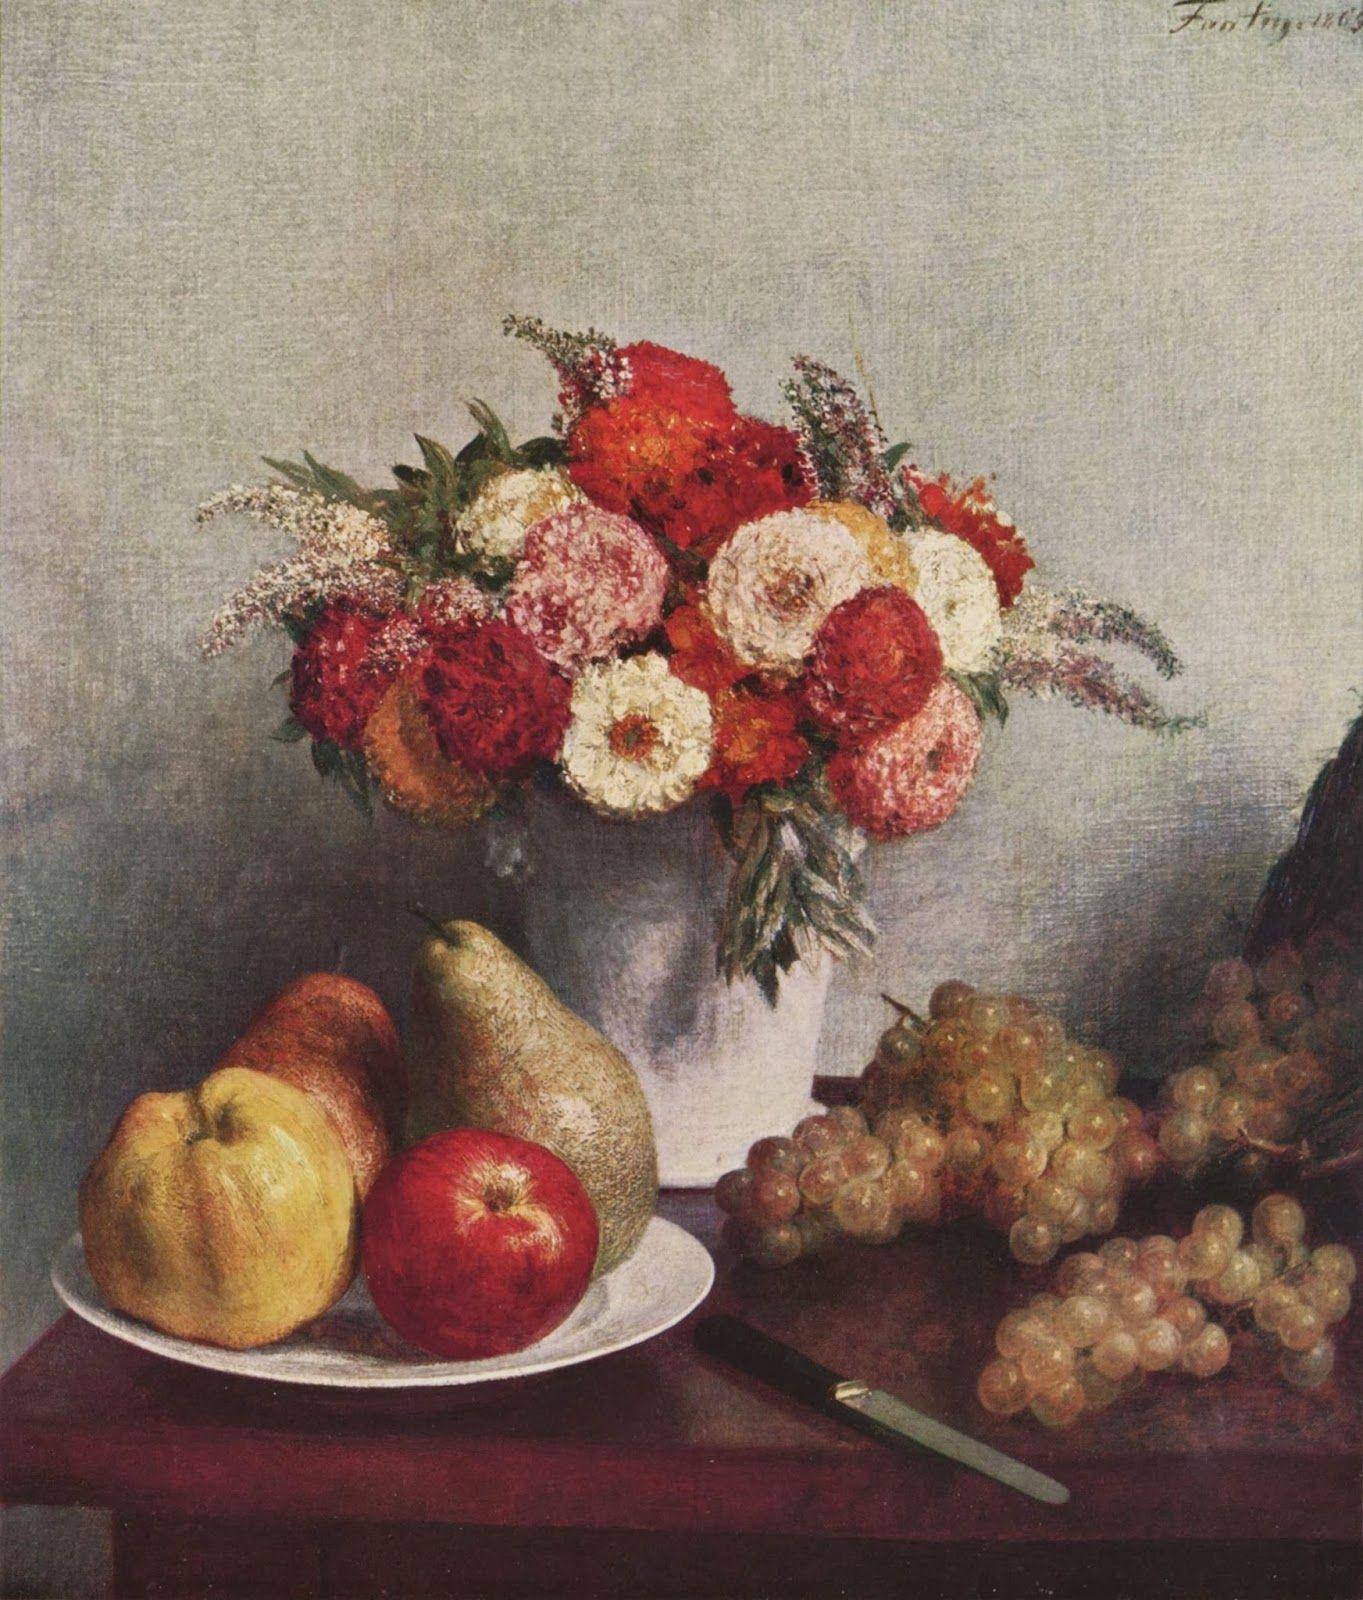 Flowers and Fruits 1865  Fantin Latour( tension plástica)